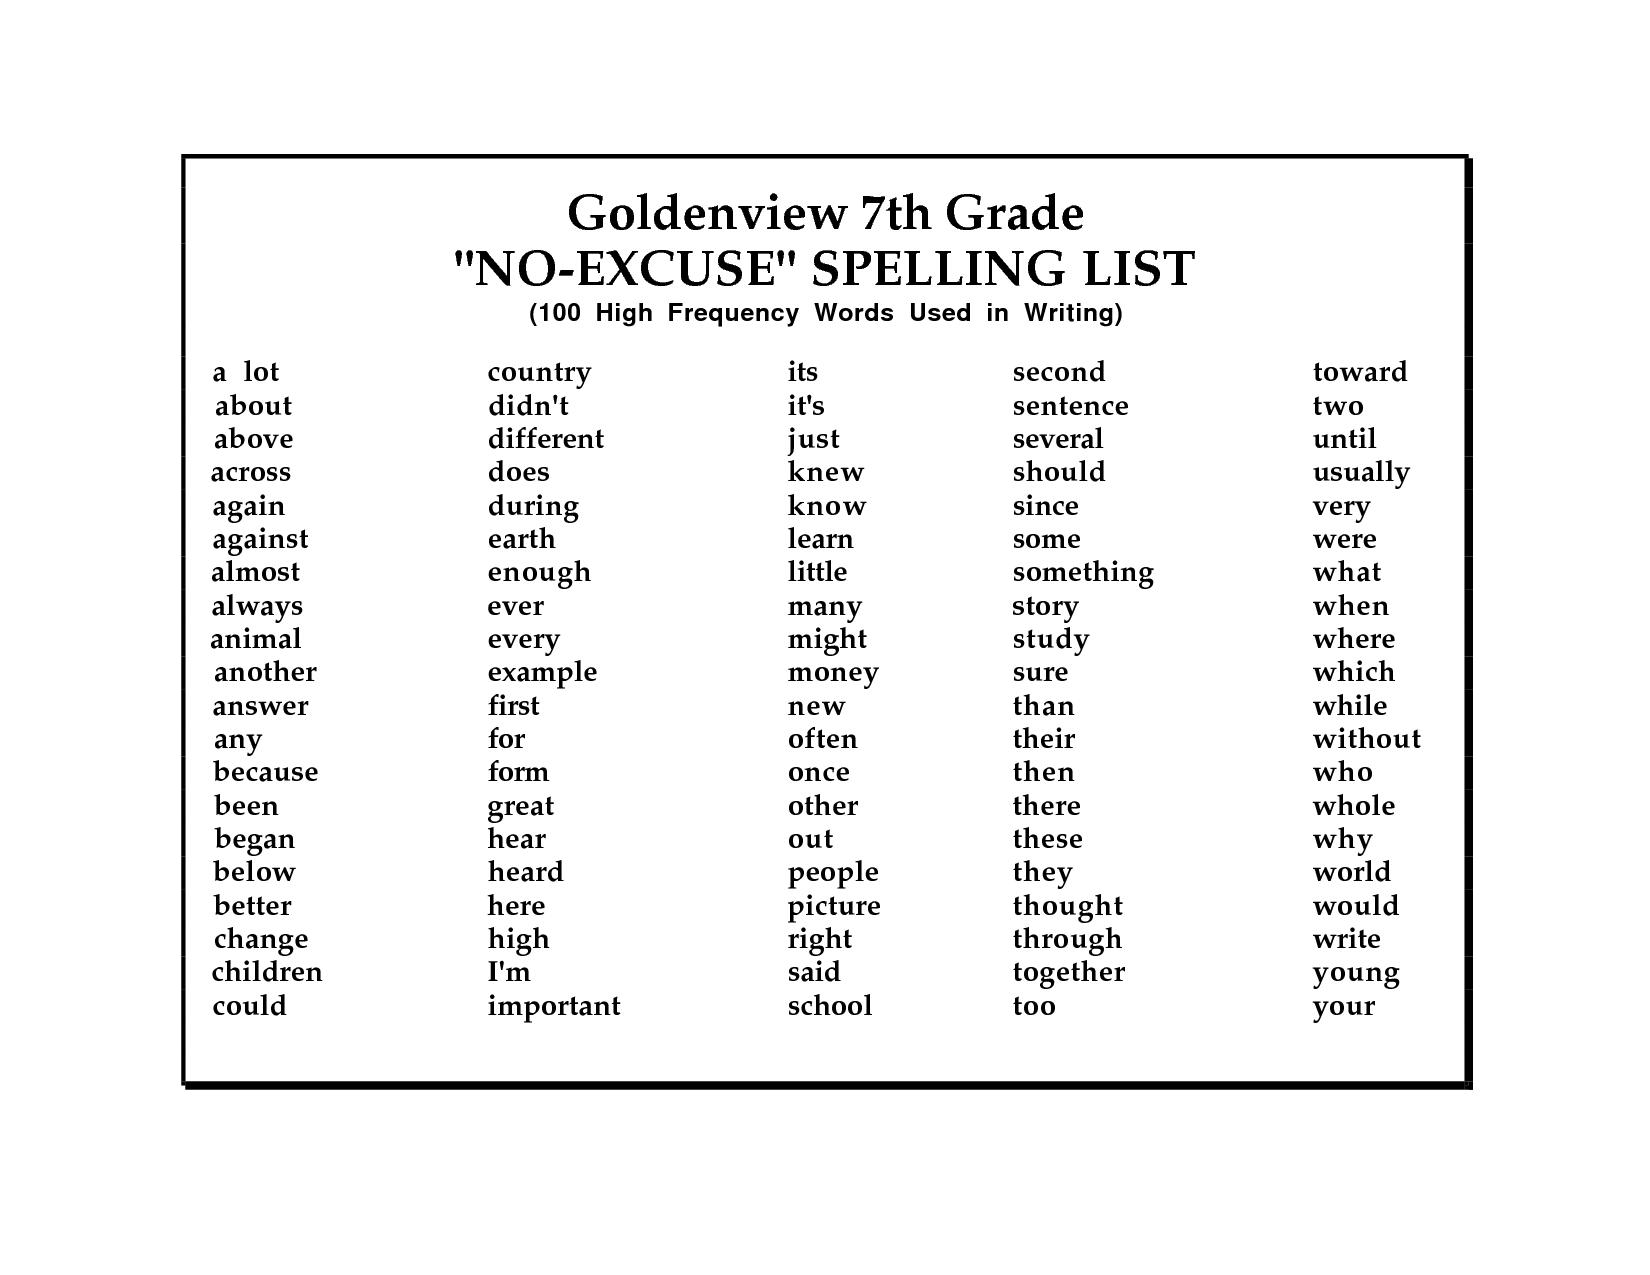 medium resolution of 8th Grade Sight Words List   13 Best Images of Vocabulary Worksheets For  3rd Grade - 3rd Grade Language Arts…   Spelling words list